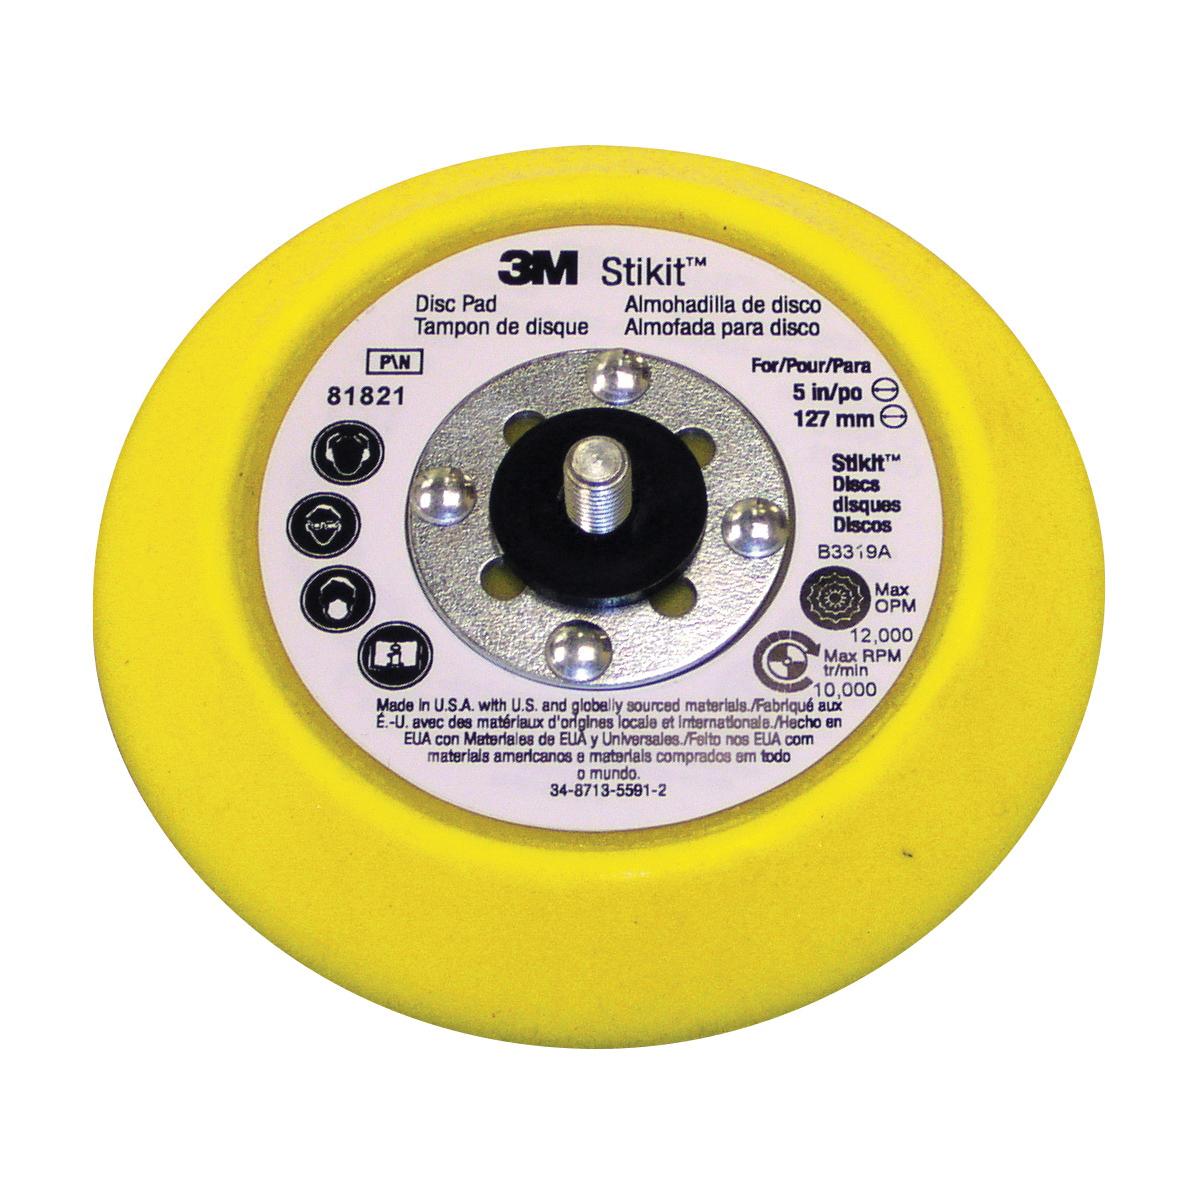 3M™ Stikit™ 051144-81821 Adhesive Back Medium Density Regular Disc Pad, 5 in Dia Pad, 3M™ Stikit™ Attachment